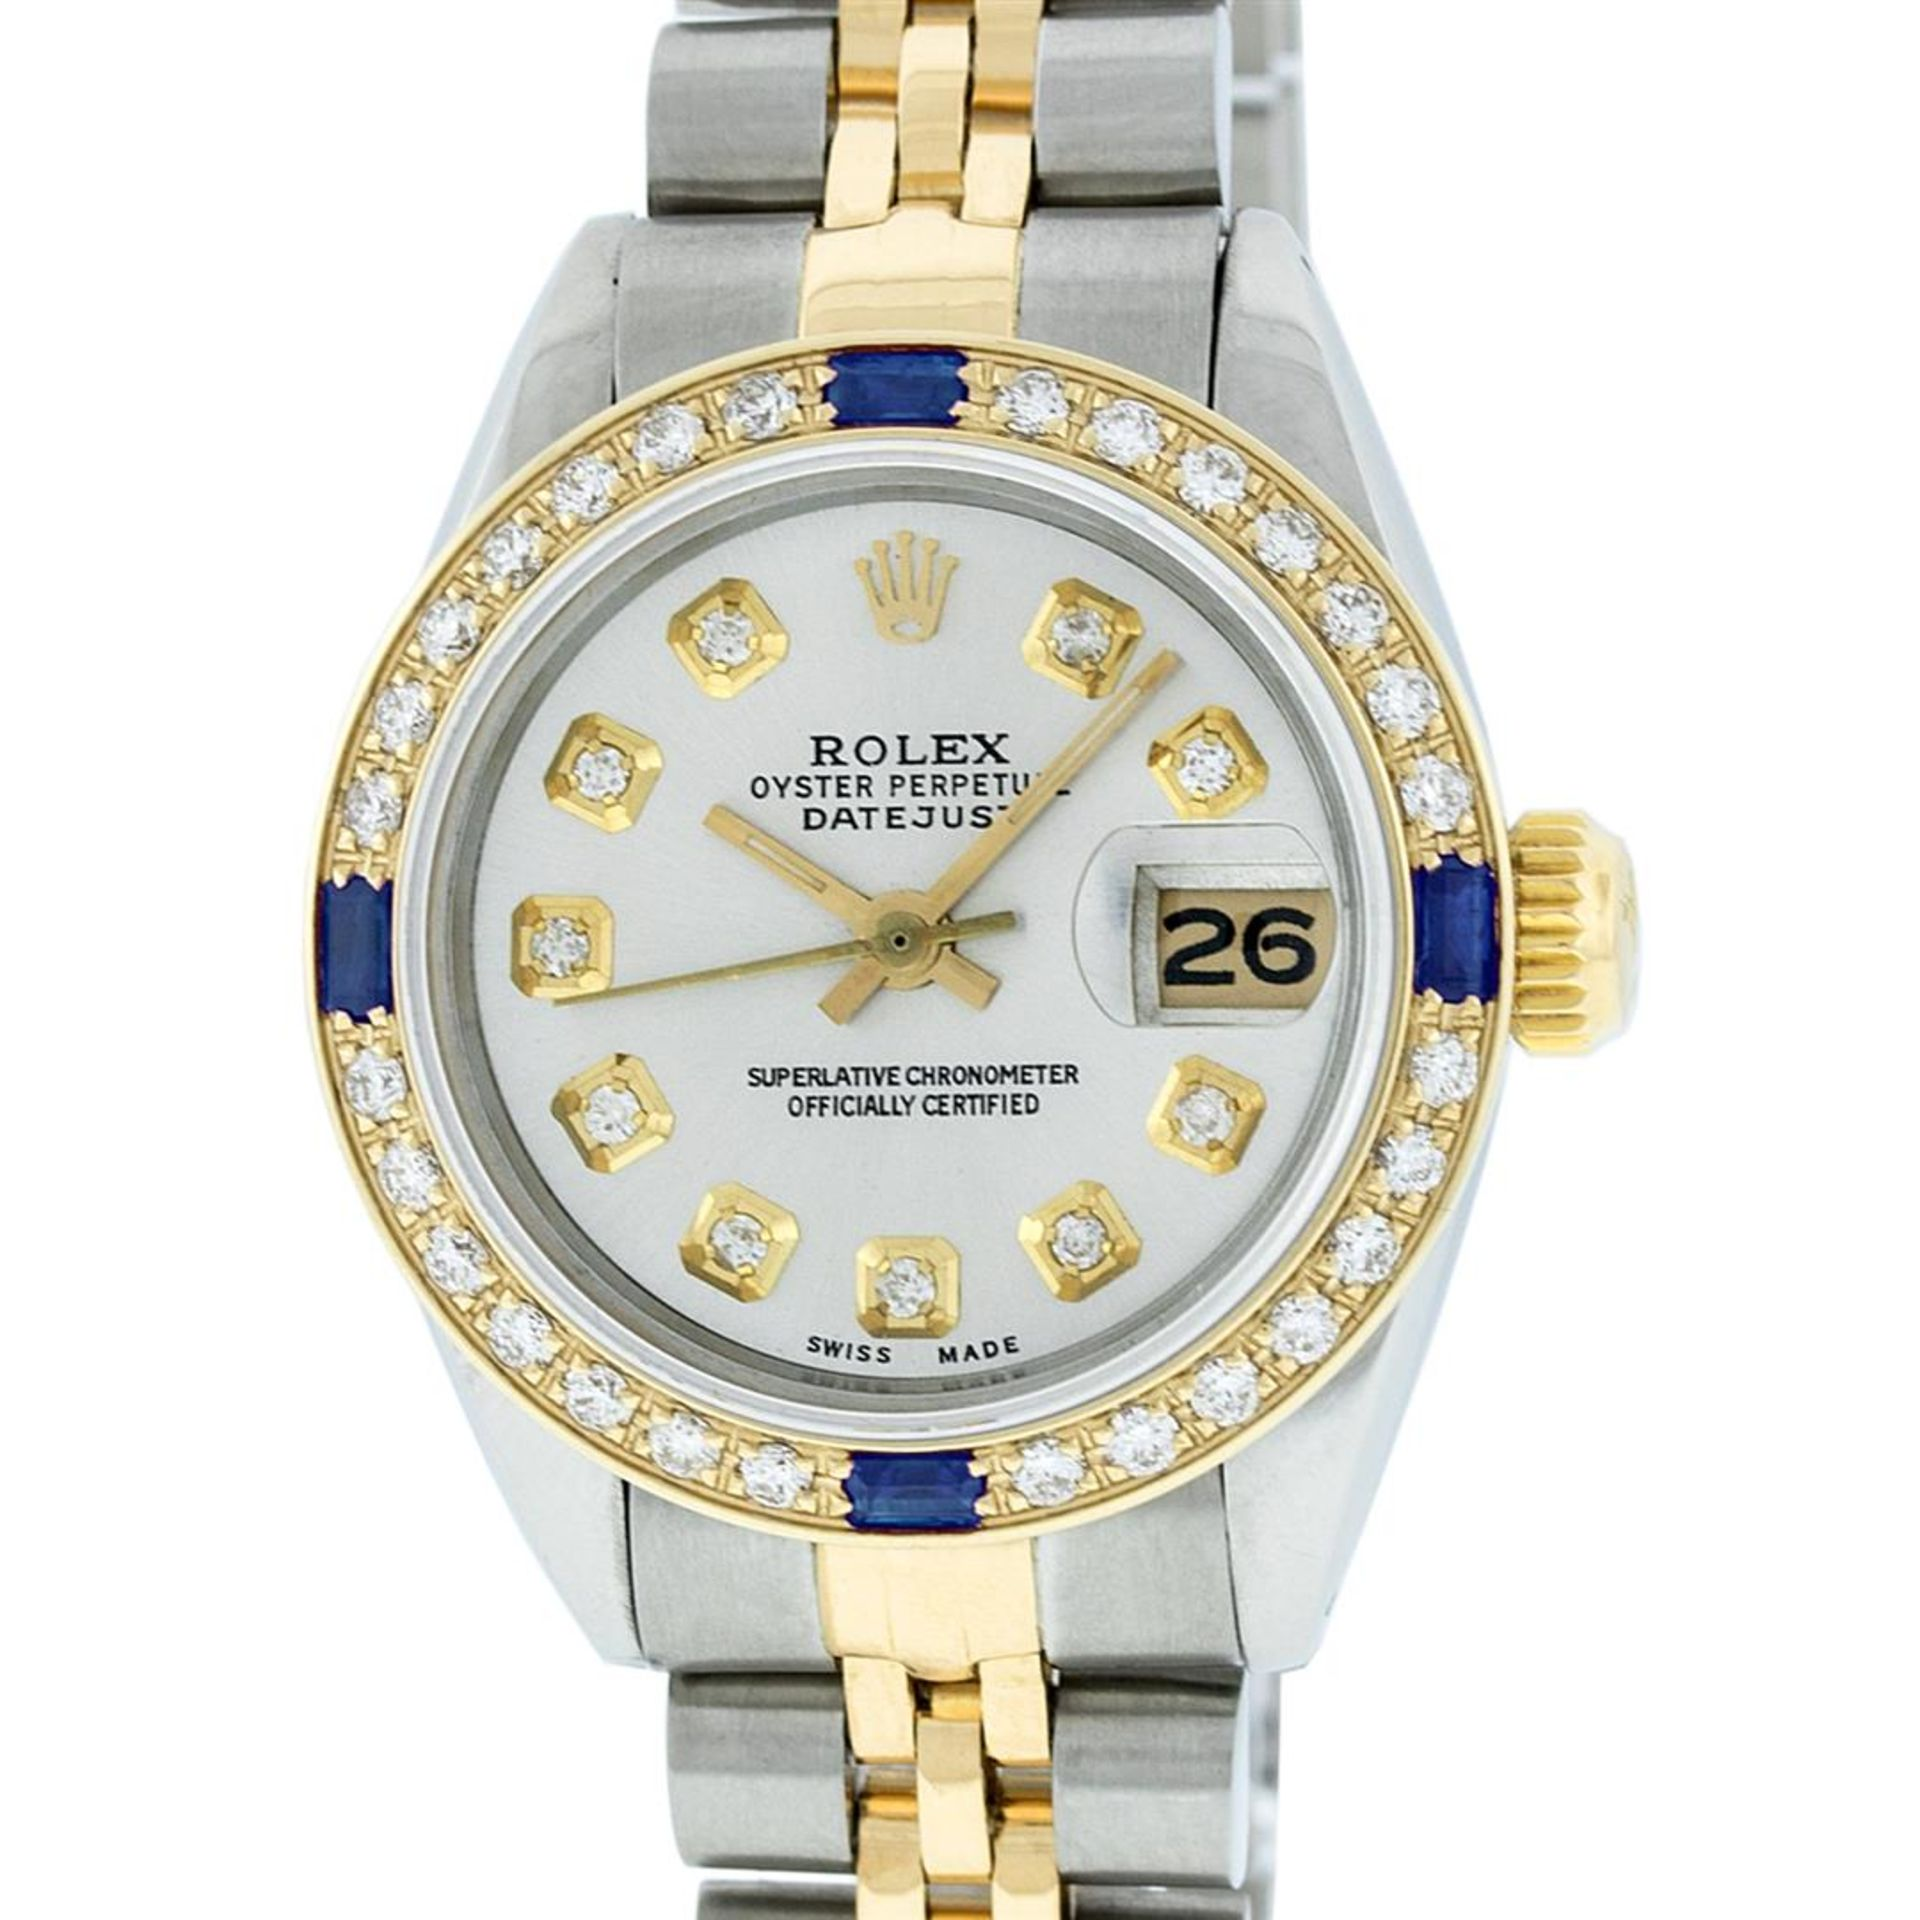 Rolex Ladies 2 Tone Silver Diamond & Sapphire Datejust Wristwatch - Image 2 of 9